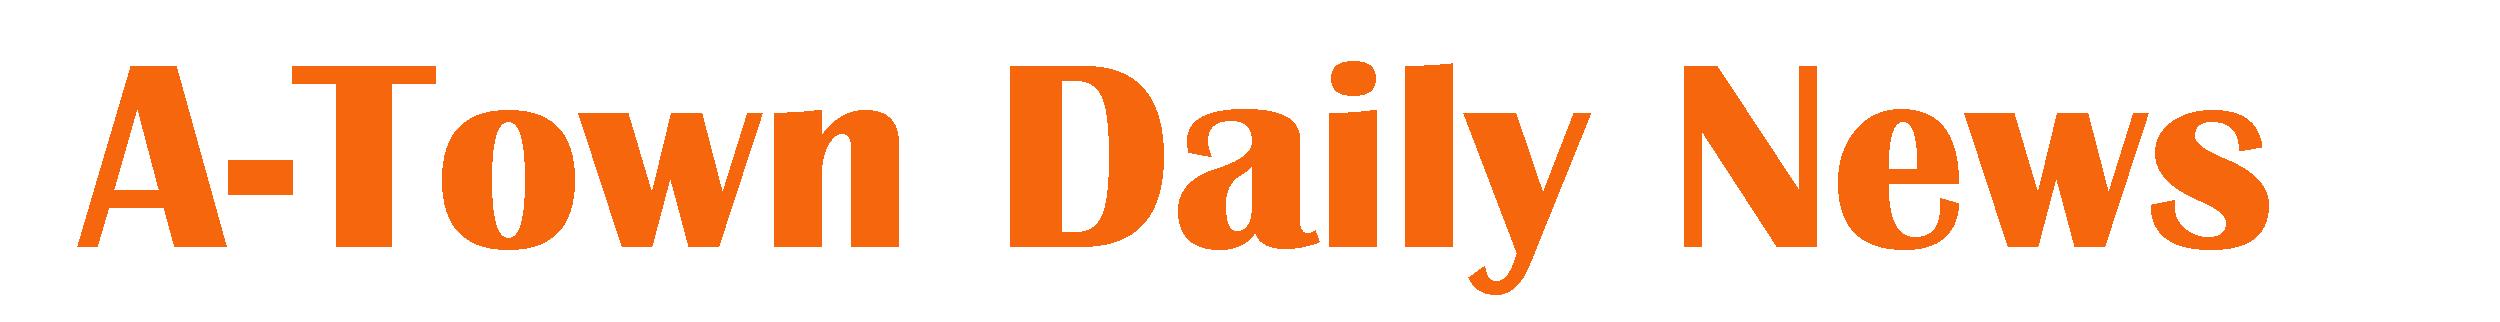 Chairman's Circle Atascadero Chamber Sponsor A-Town Daily News